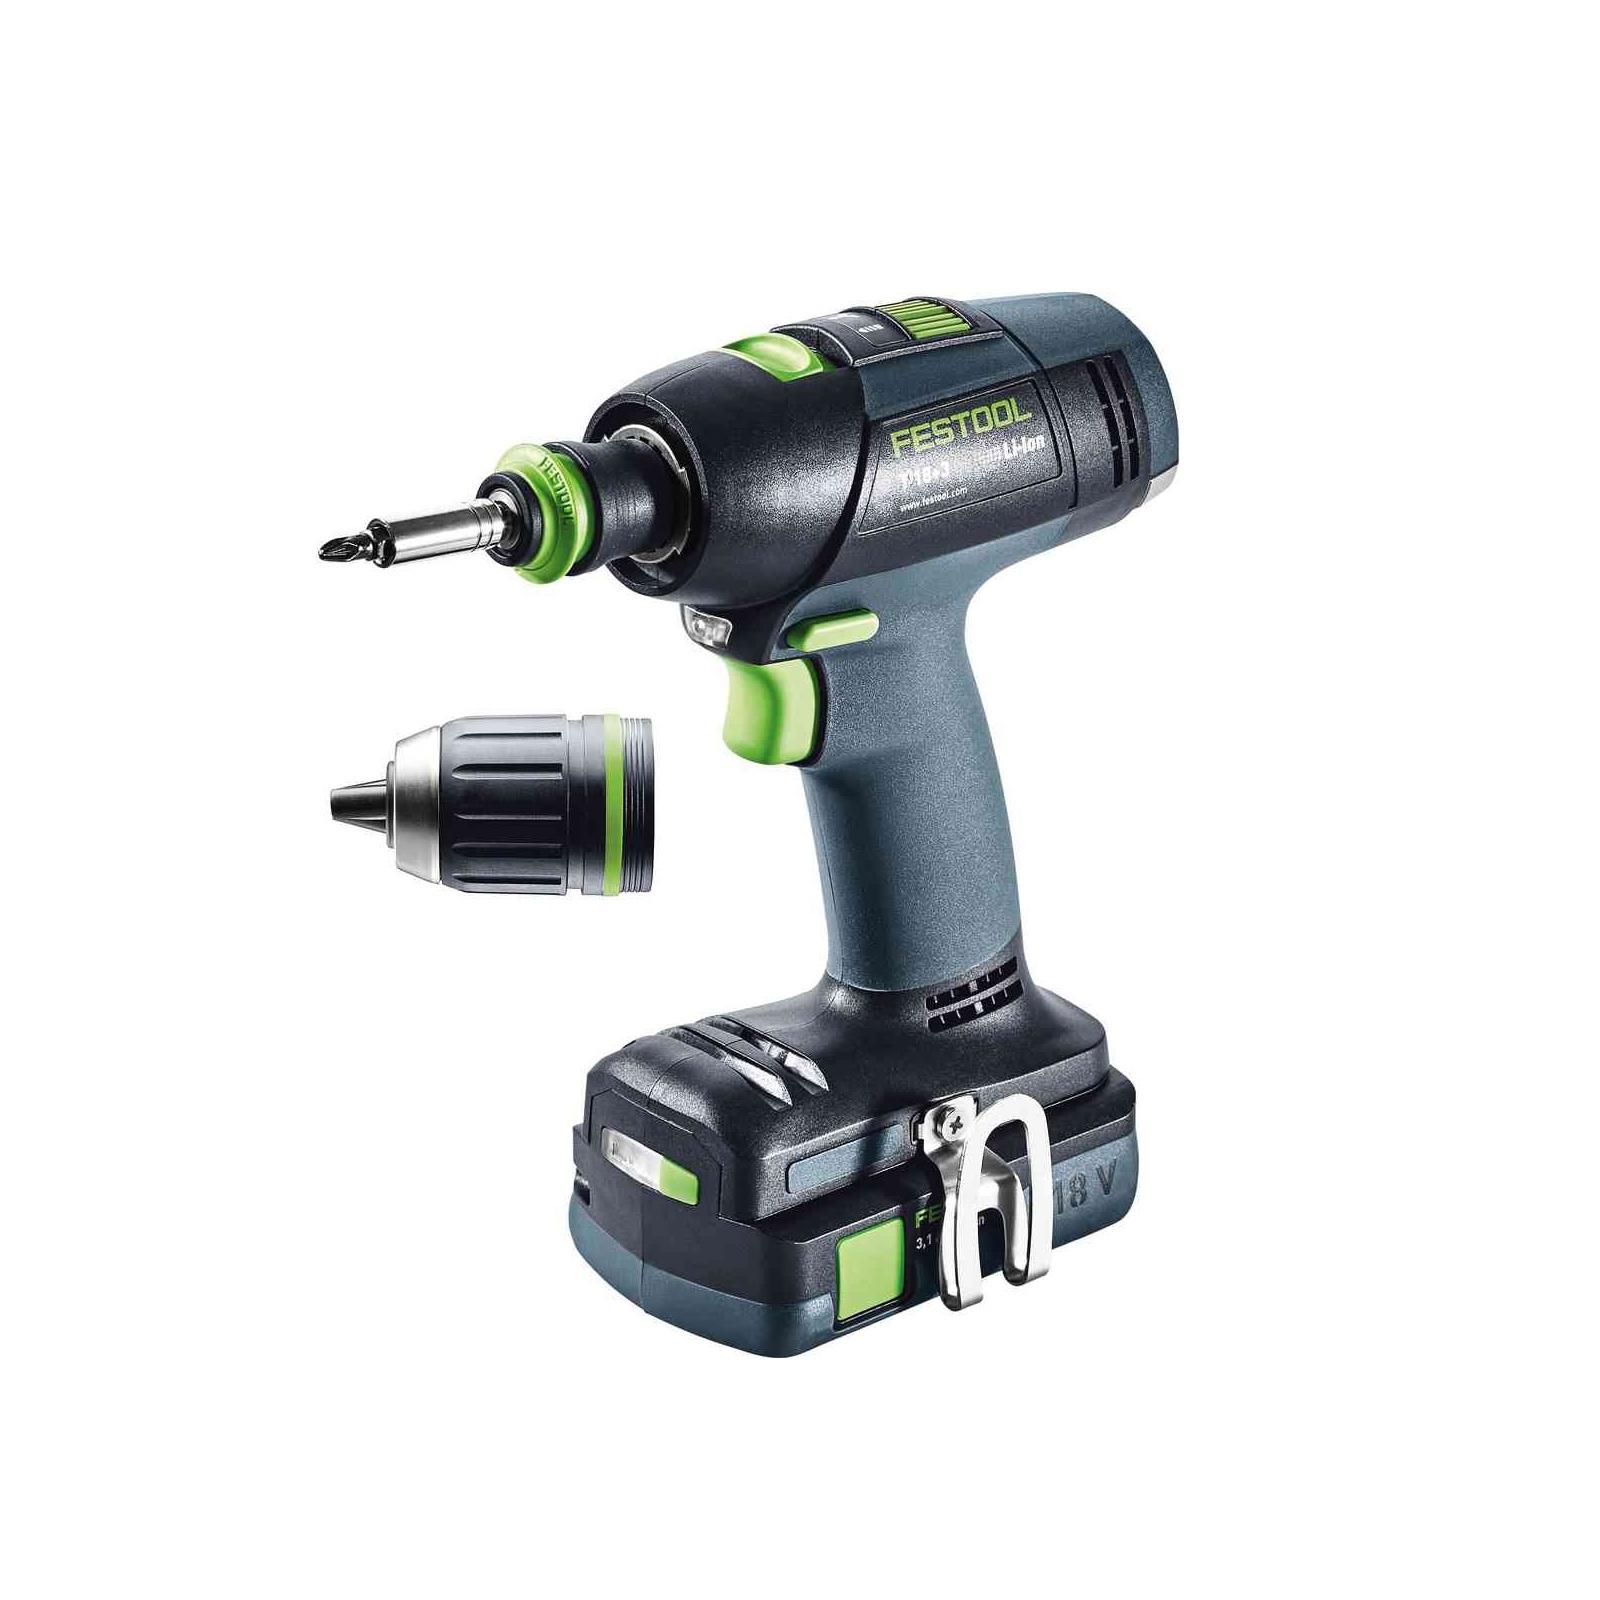 Festool T18 Cordless Drill